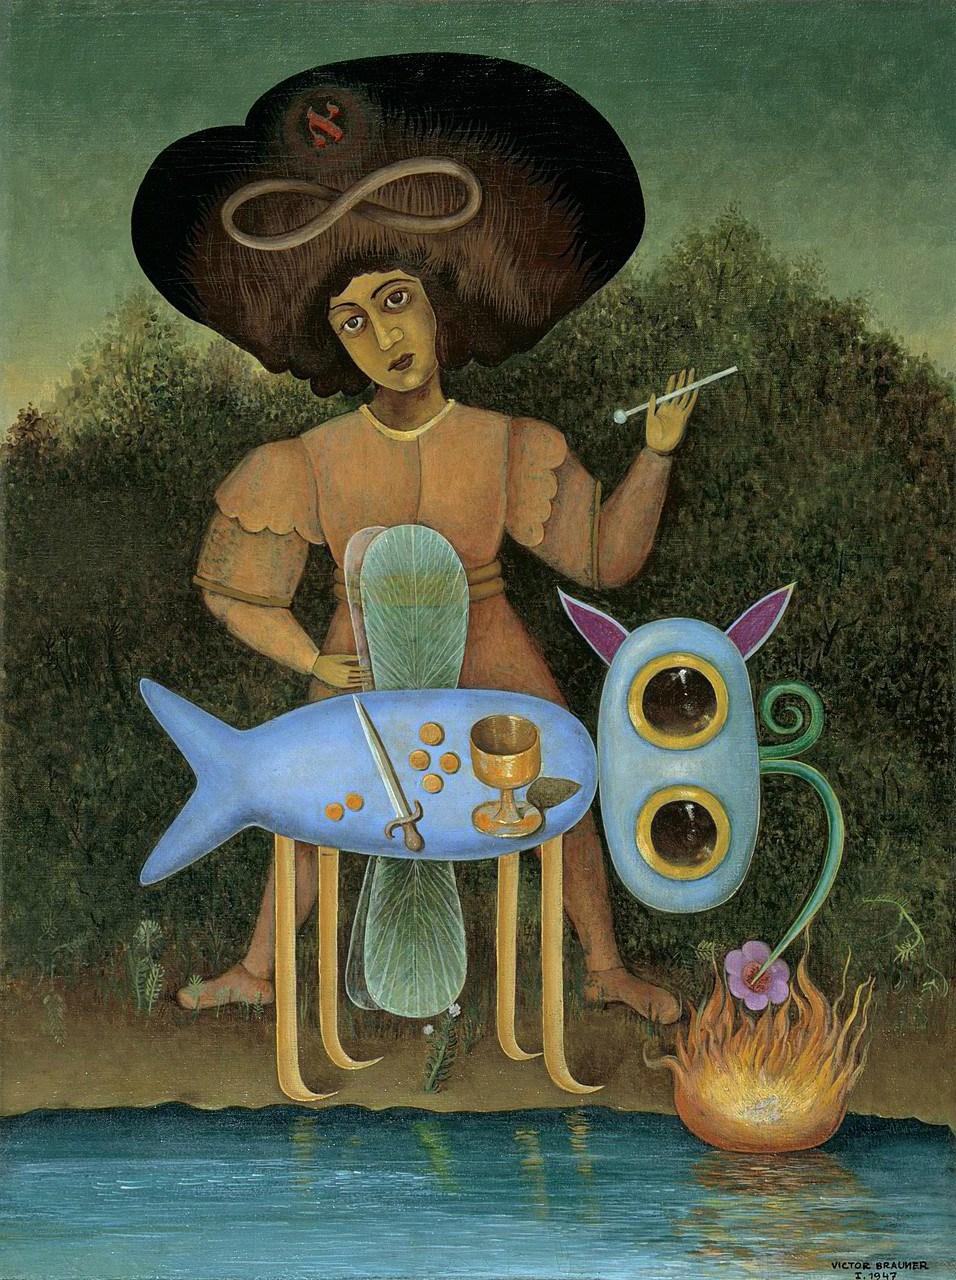 VICTOR BRAUNER - The Surrealist   The Solomon R. Guggenheim Foundation, Peggy Guggenheim Collection, Venice, 1976  © 2018 Artists Rights Society (ARS), New York/ADAGP, Paris